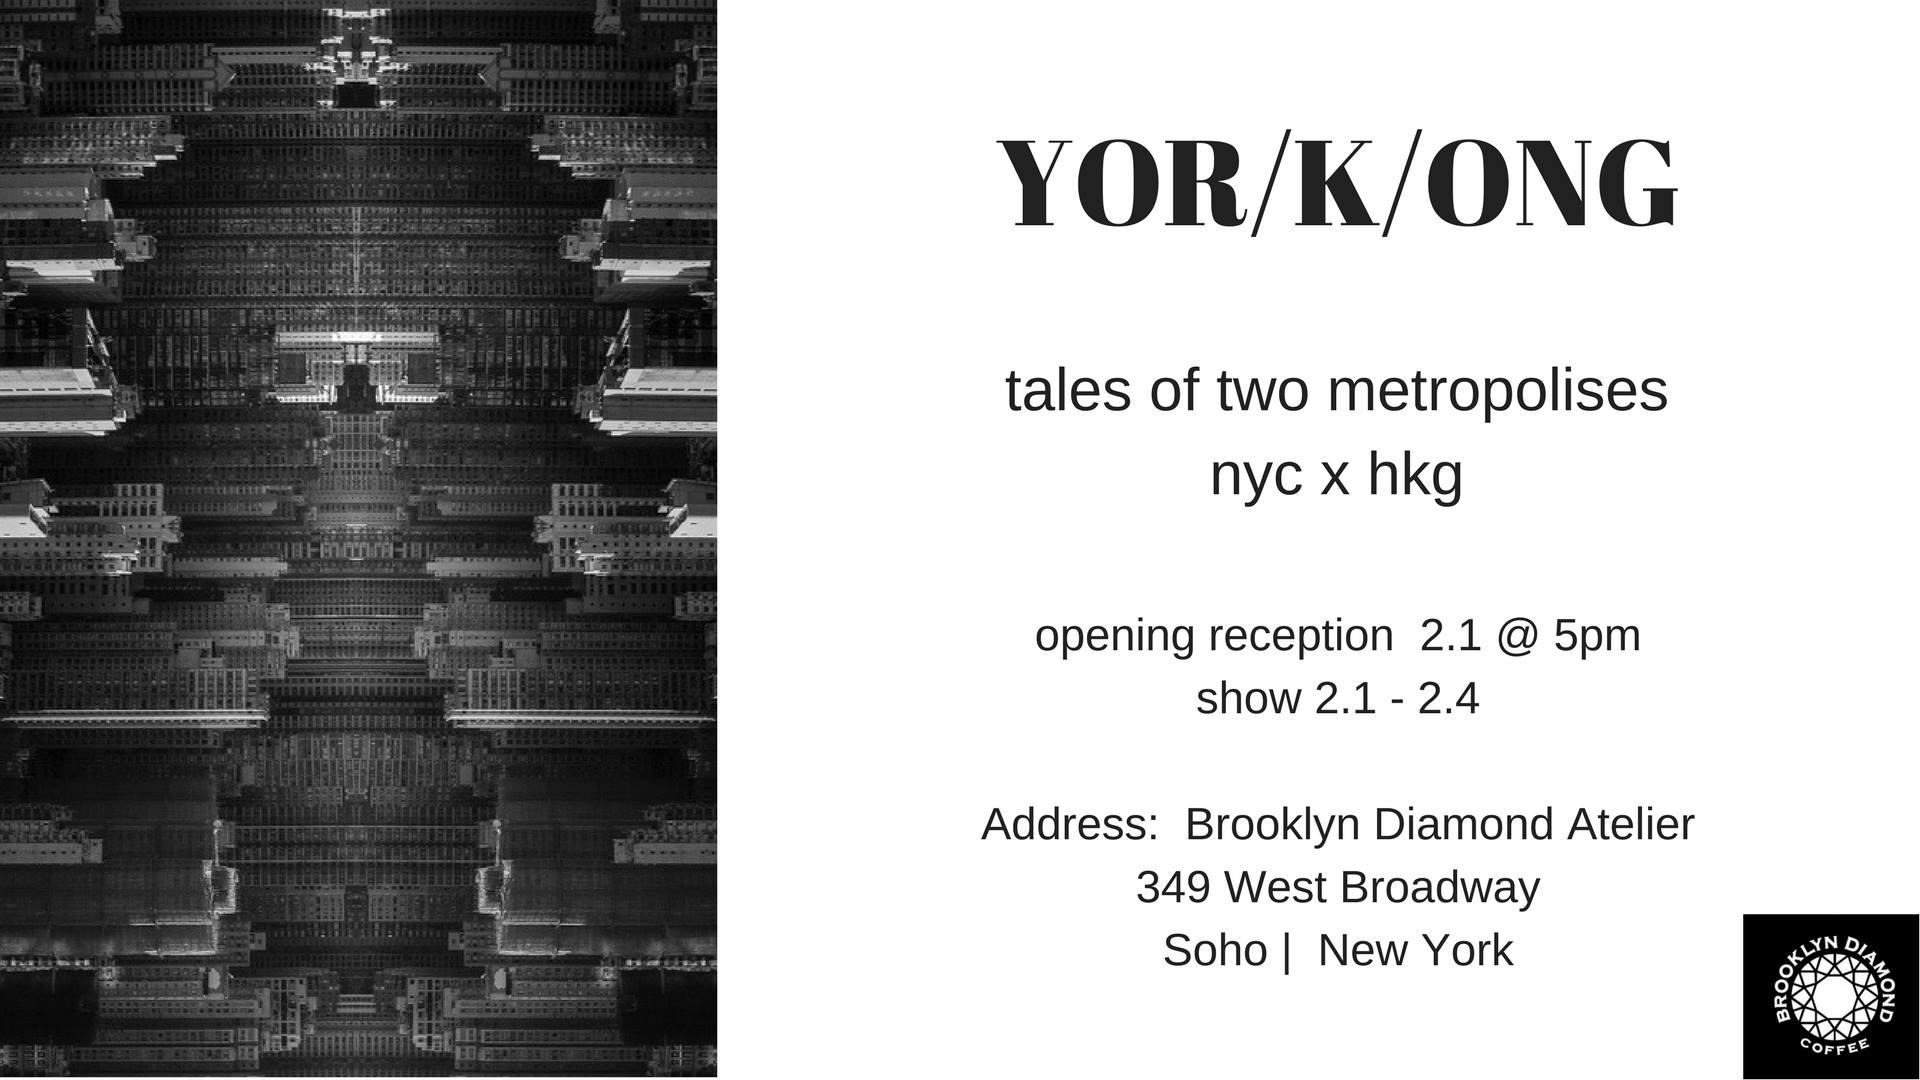 yorkong-NYC_Exhibition